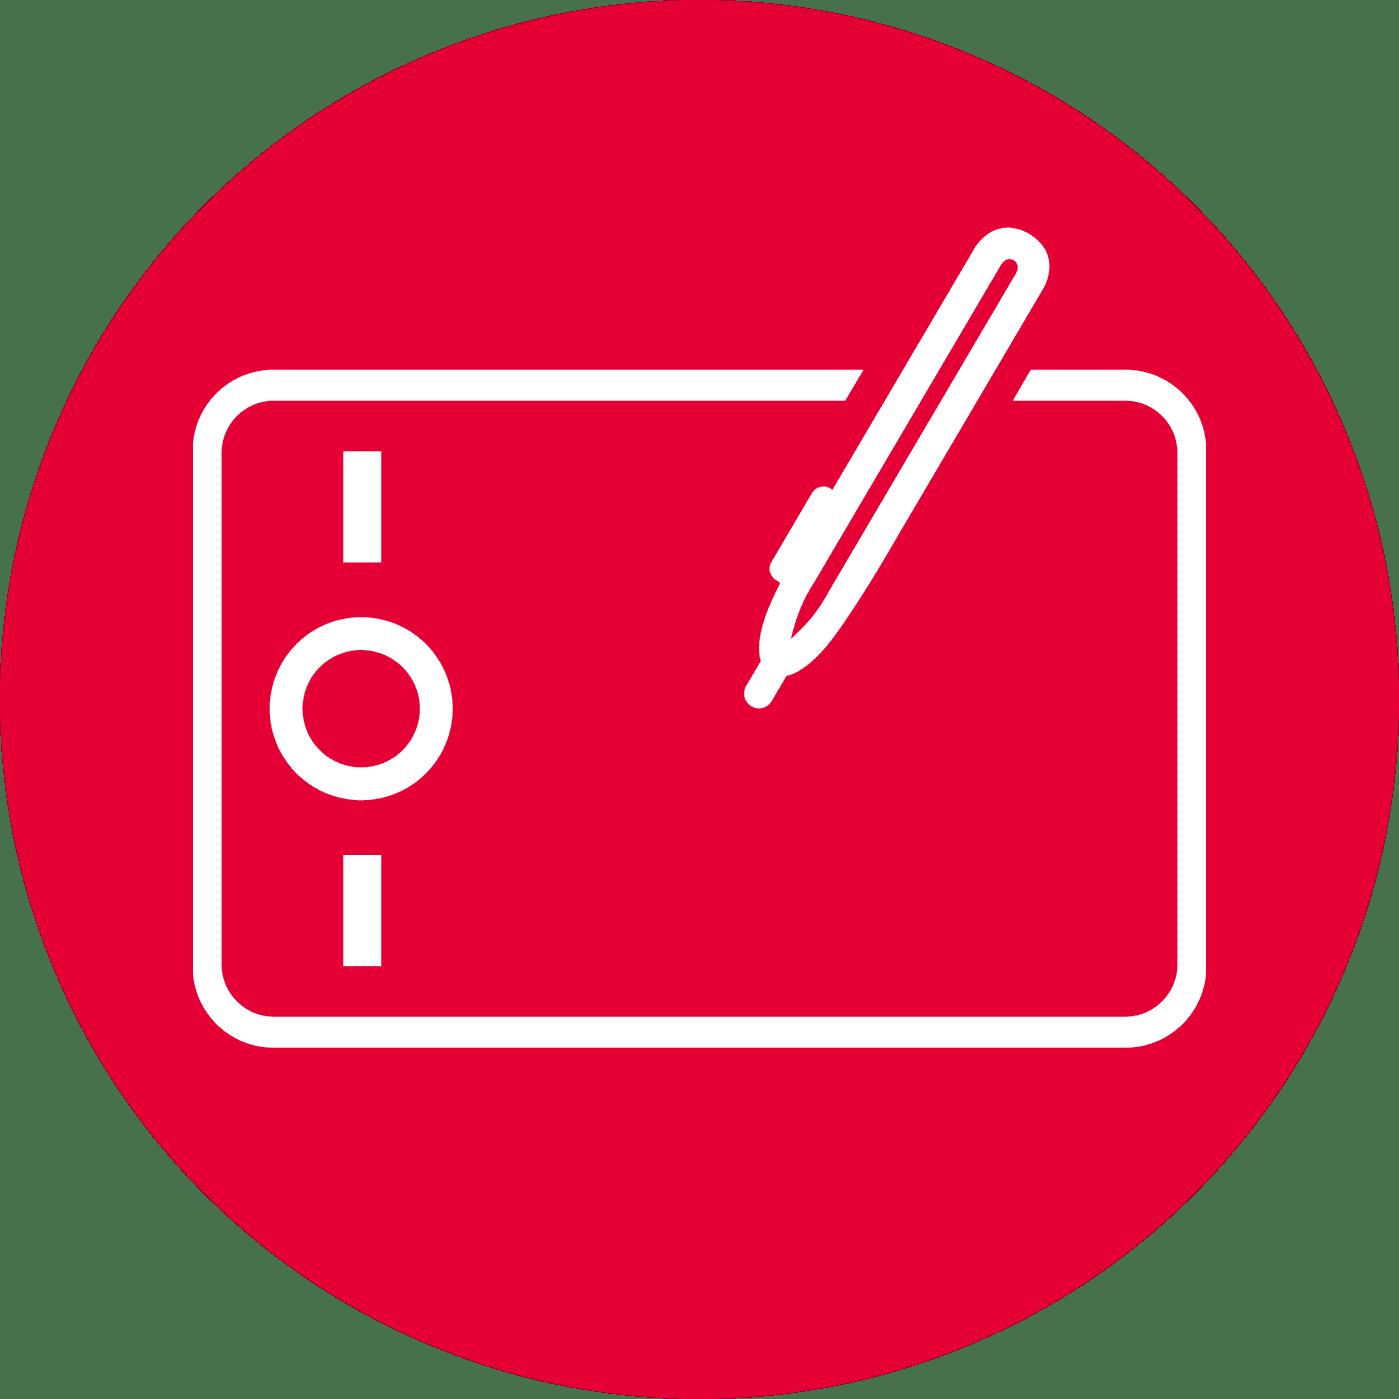 Corporate Design Grafik Design Corporate IdentitY Logo Brand Kreation Firmendrucksachen Briefschaften Schriftzug Fotografie Digitale Bildbearbeitung Photo-Composing Webdesign Online-Shop Homepage Video-Erstellung Motion-Design Movie-Editing ShowMyProject Digital Agentur Basel 2021